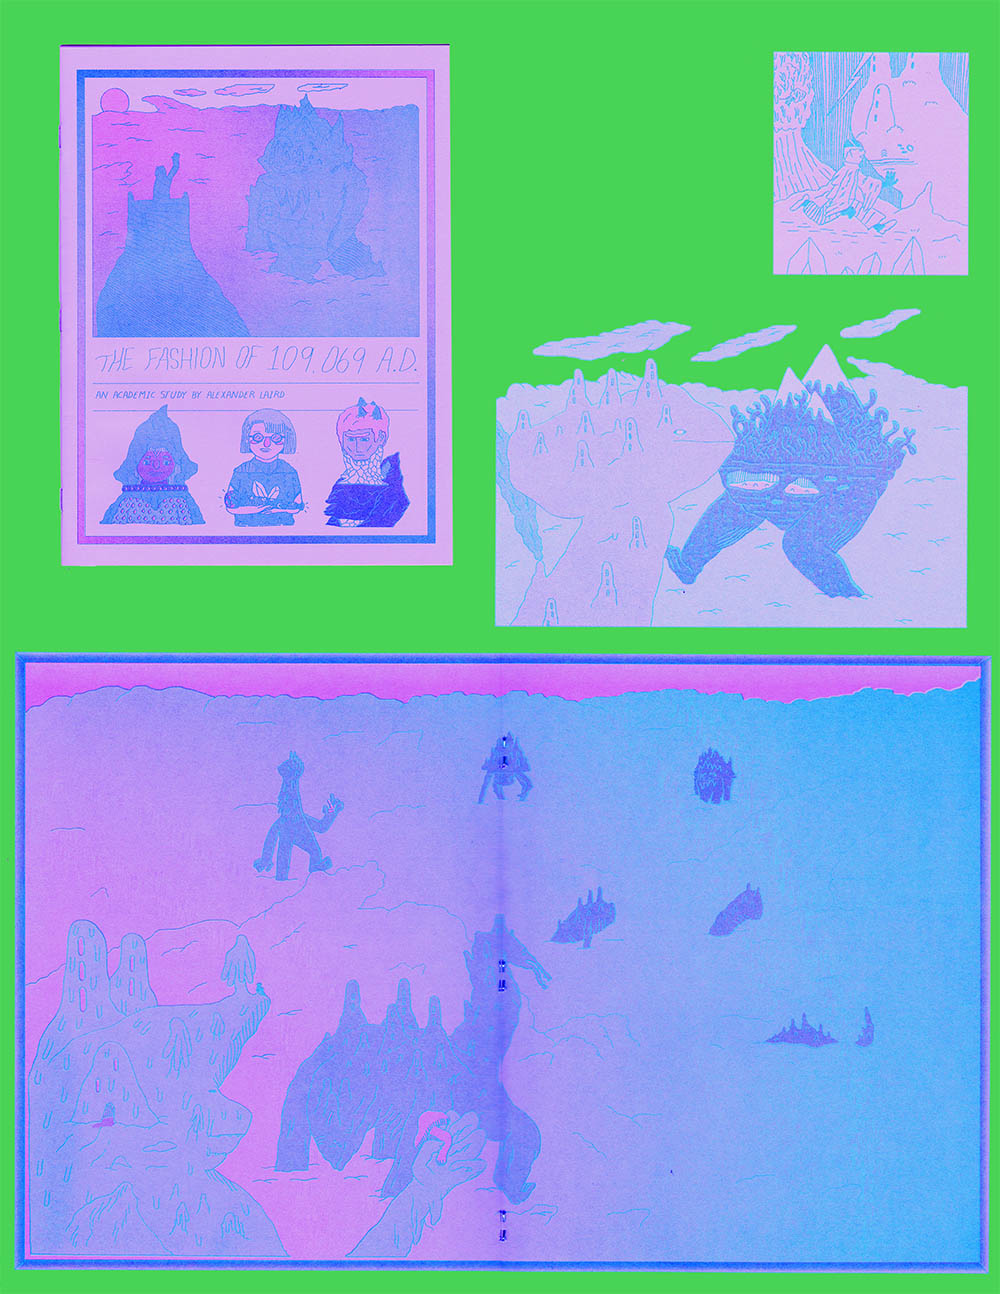 CC CH pdf_0000s_0008_Brightness_Contrast 4.jpg